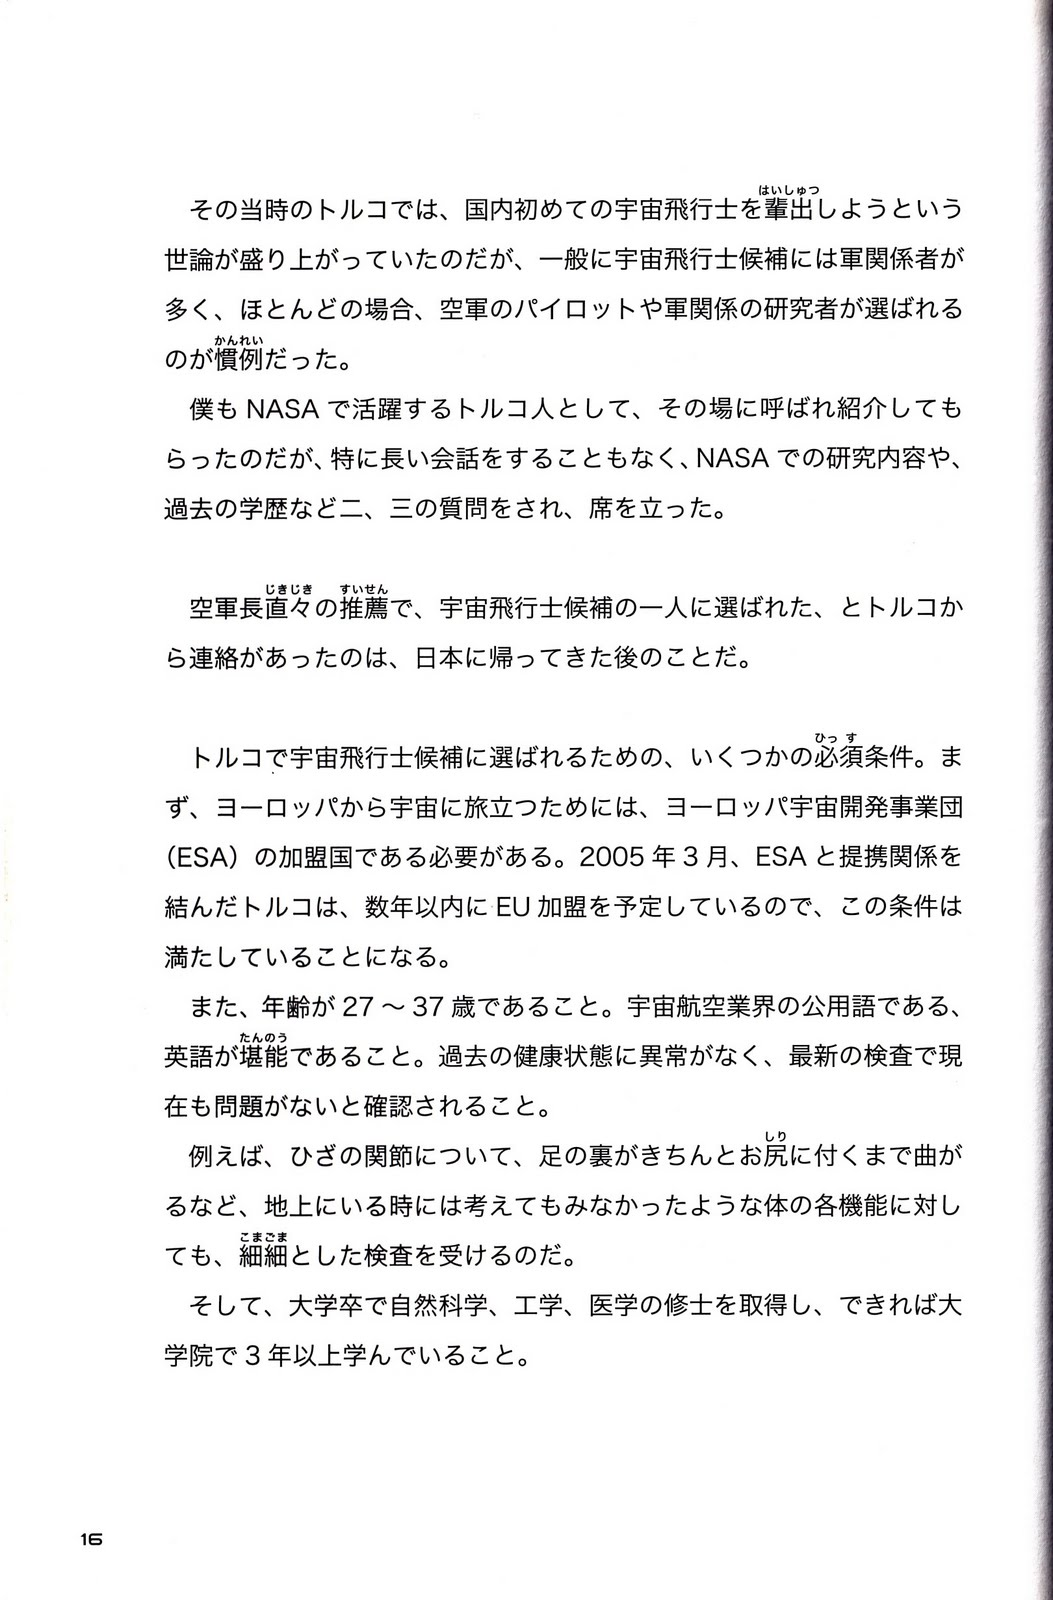 [p16.jpg]